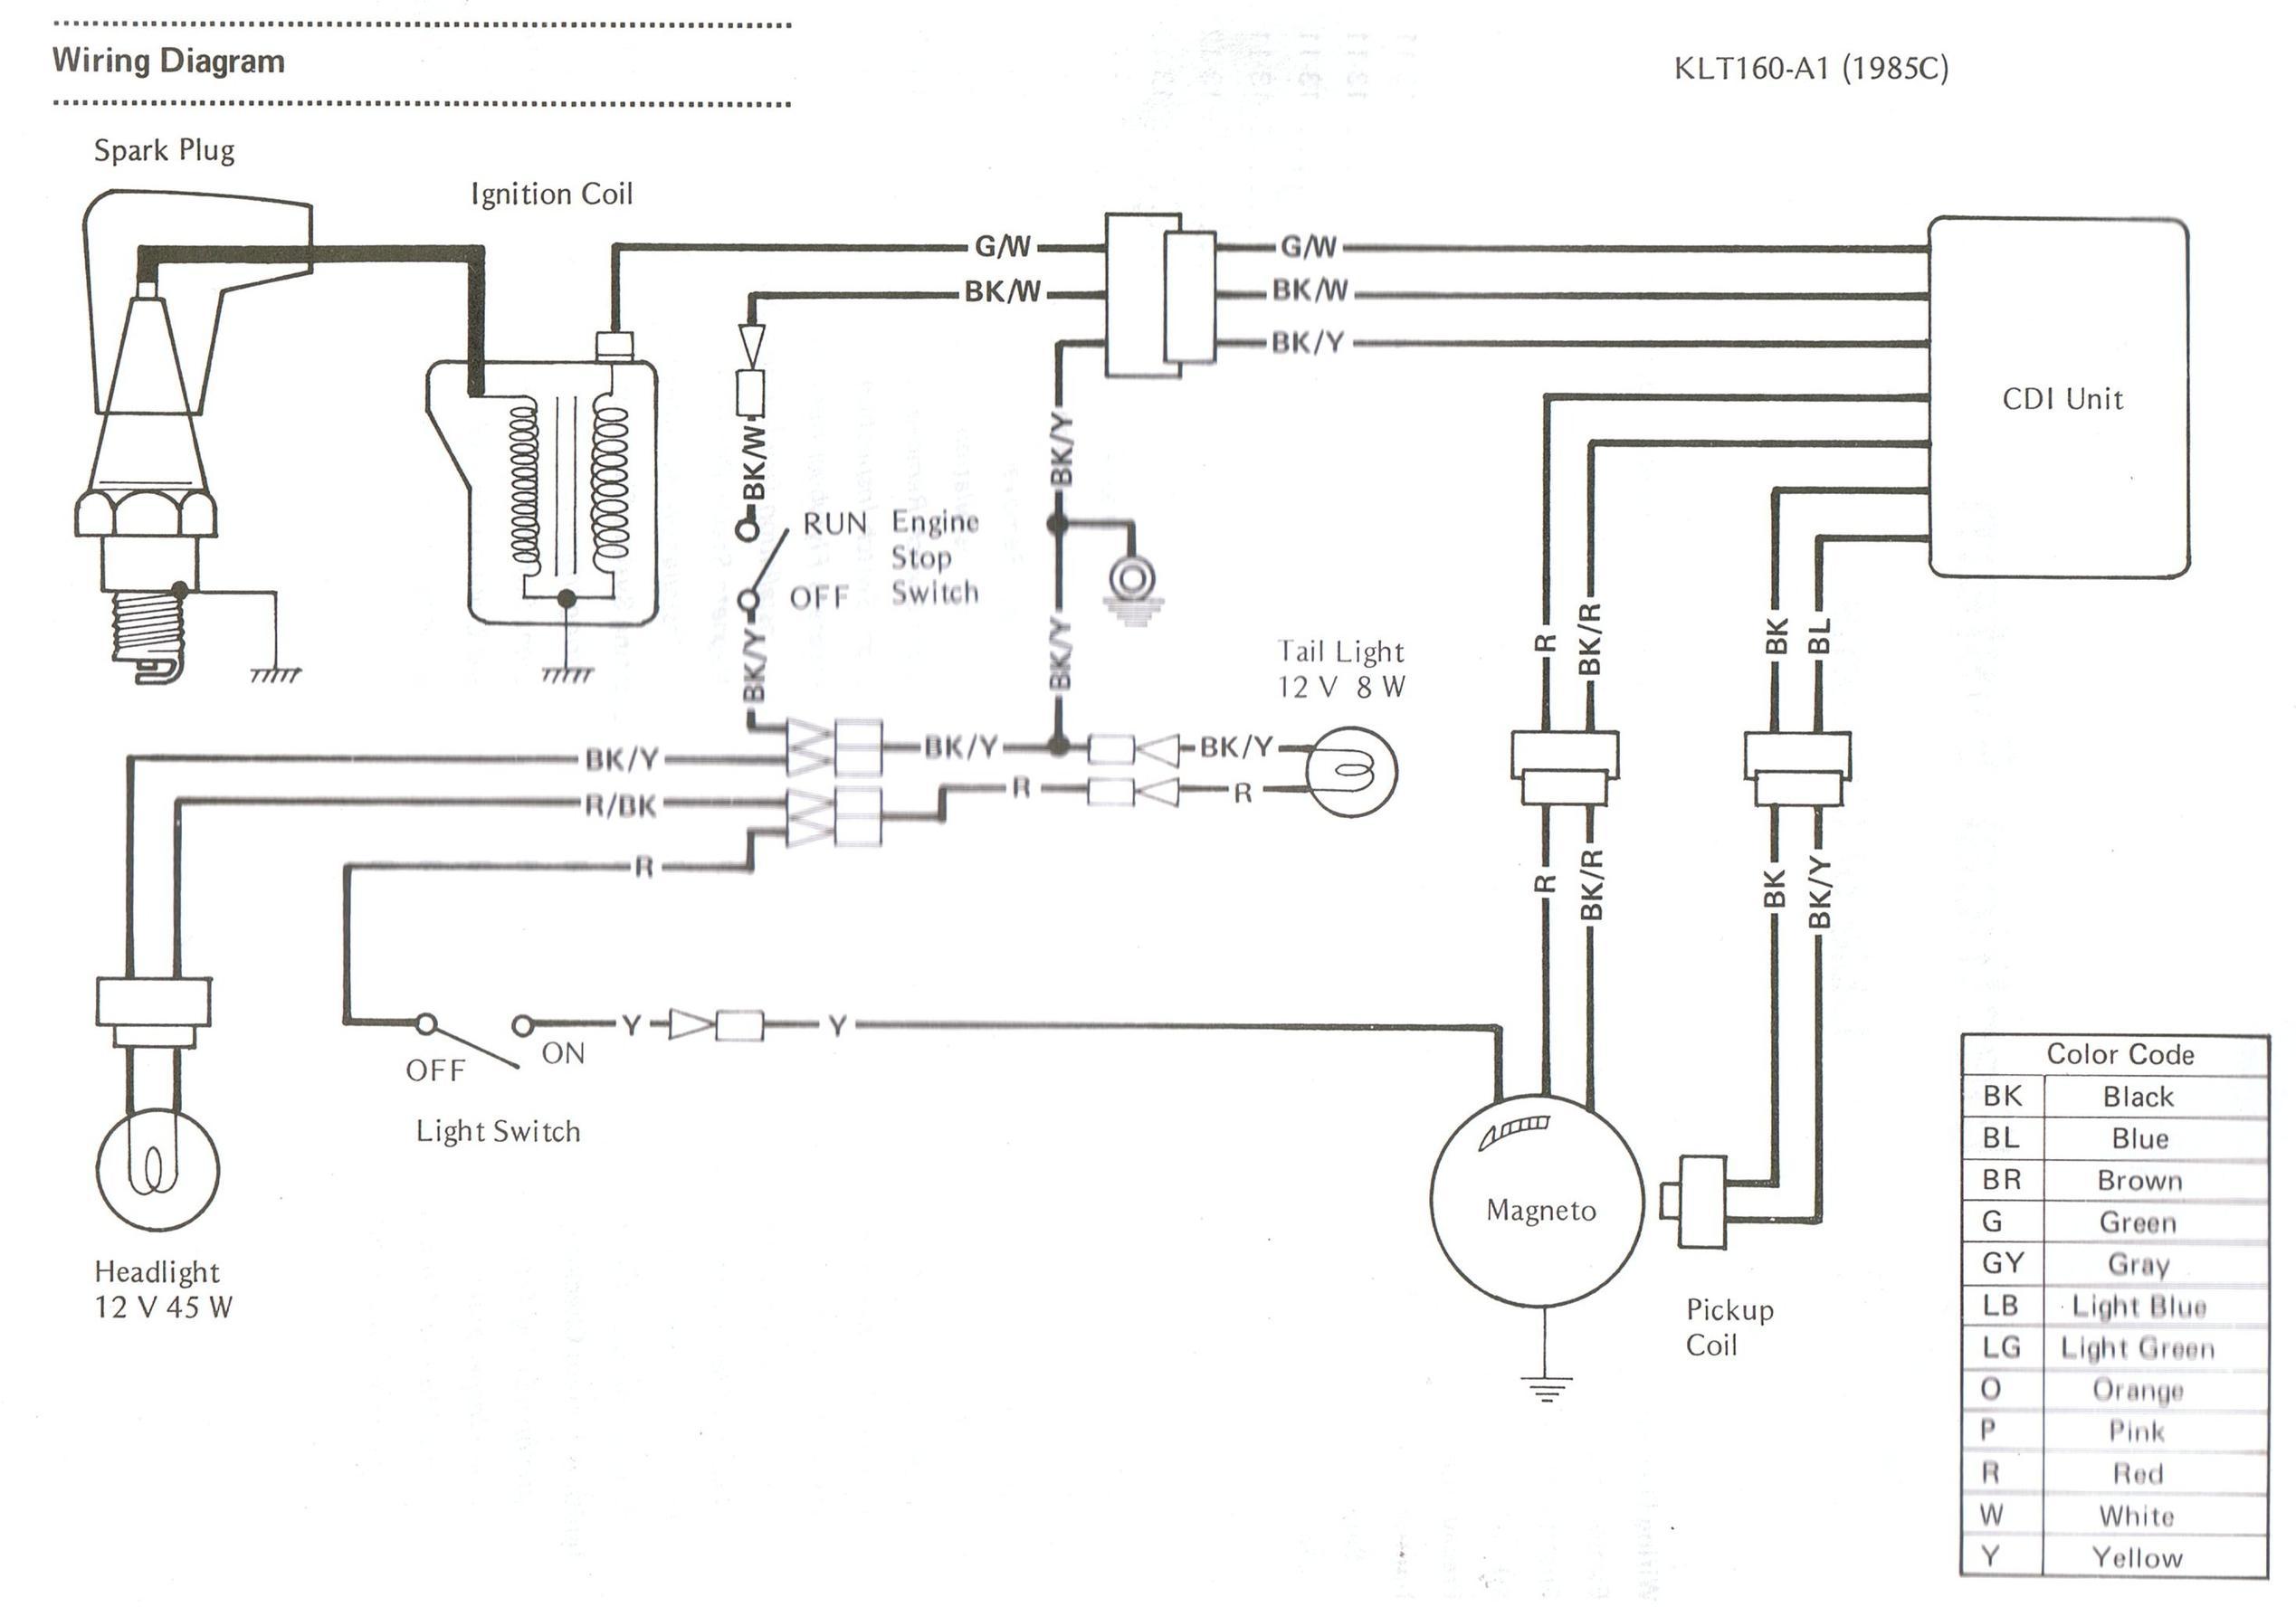 kawasaki kl250 wiring diagram kawasaki wiring diagrams online